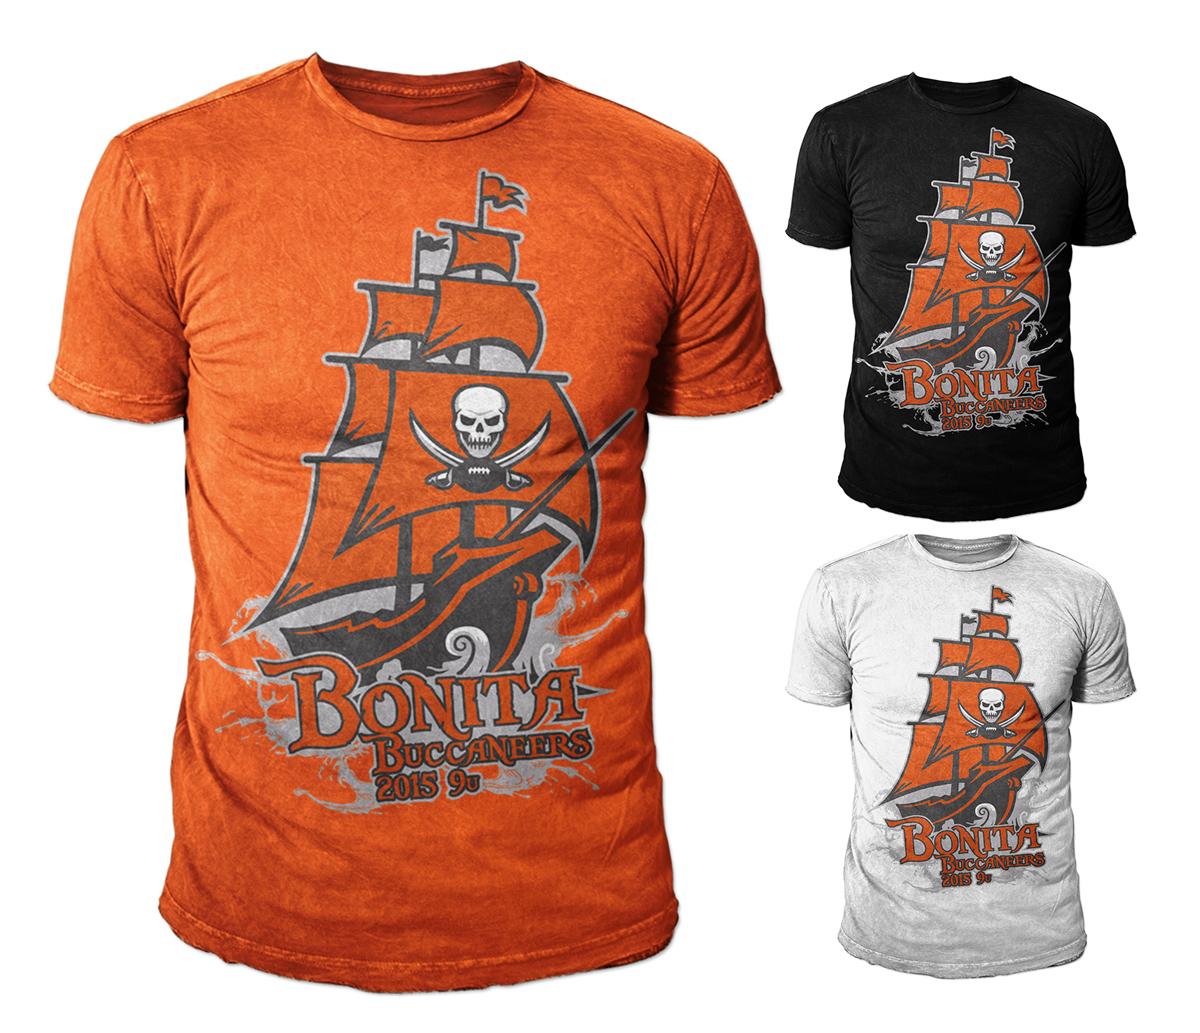 Design t shirt kid - T Shirt Design By Kid Ink For Bonita Buccaneers Youth Football Shirt Design 2015